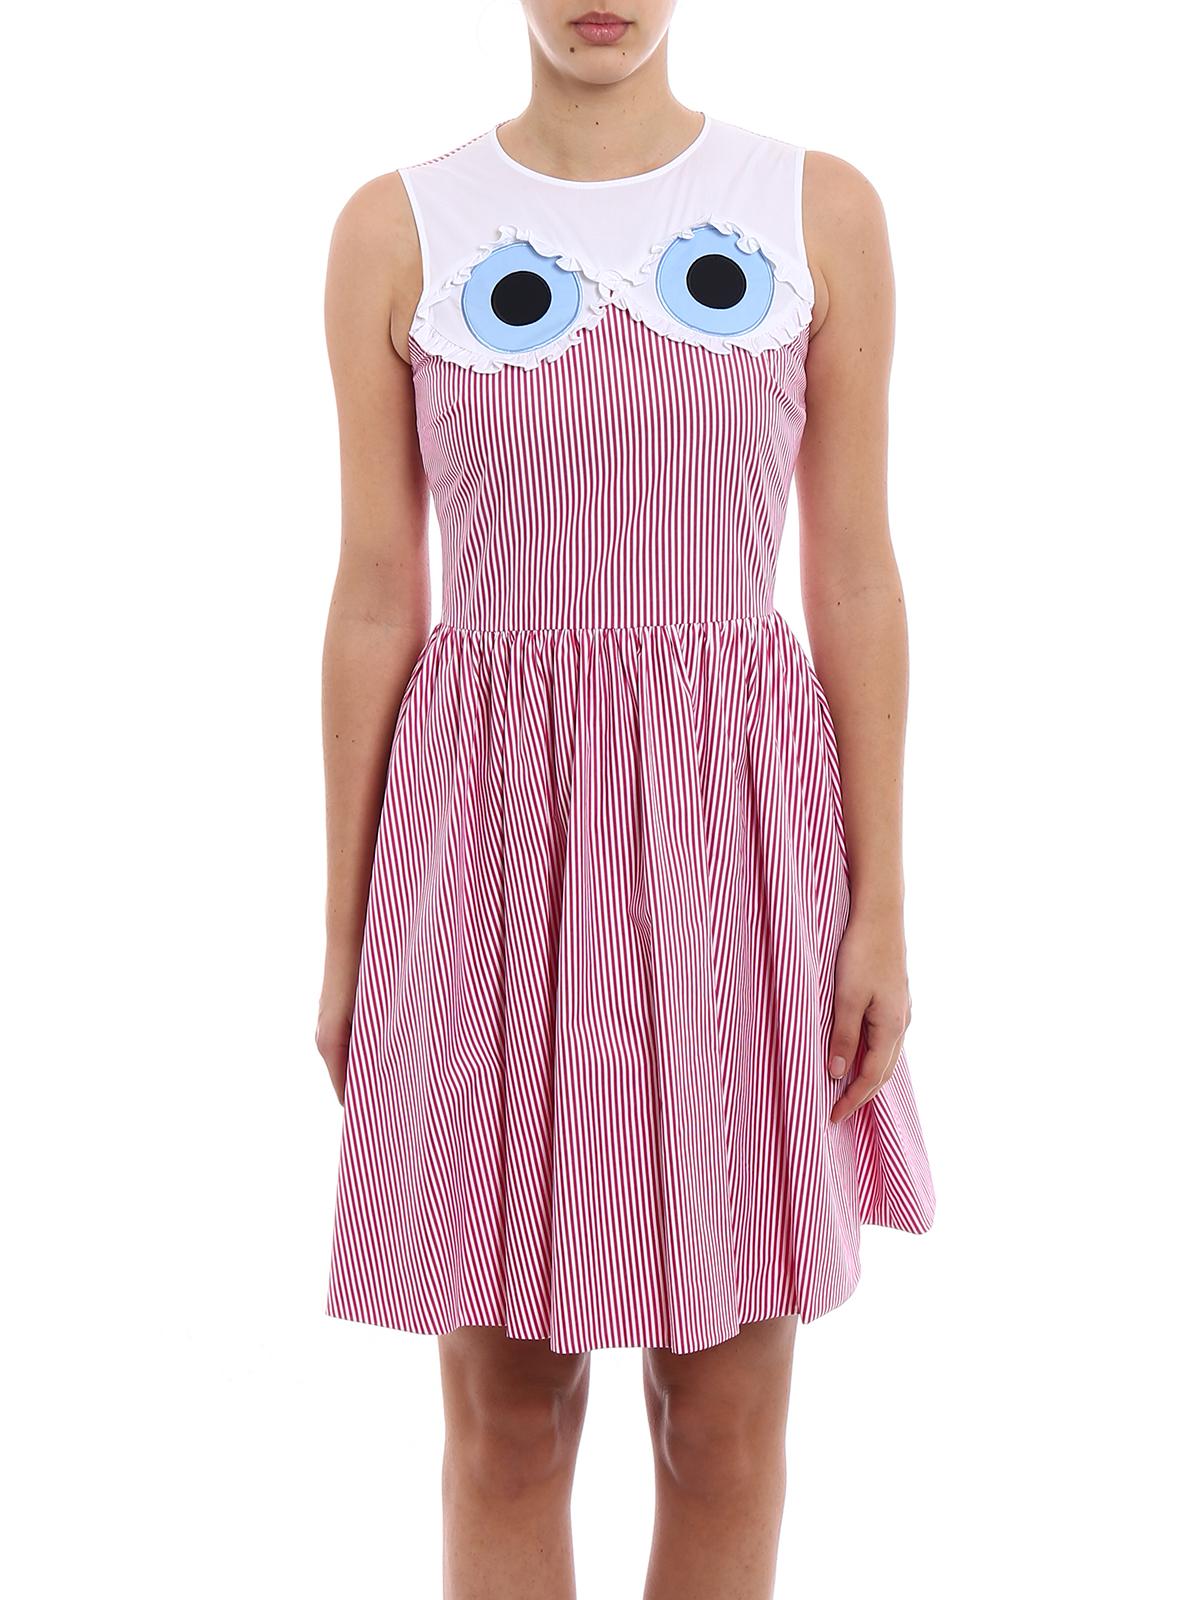 Vv546elara3010 Kleid Knielange Vivetta Pink Knielanges Kleider xeCoWEQrBd